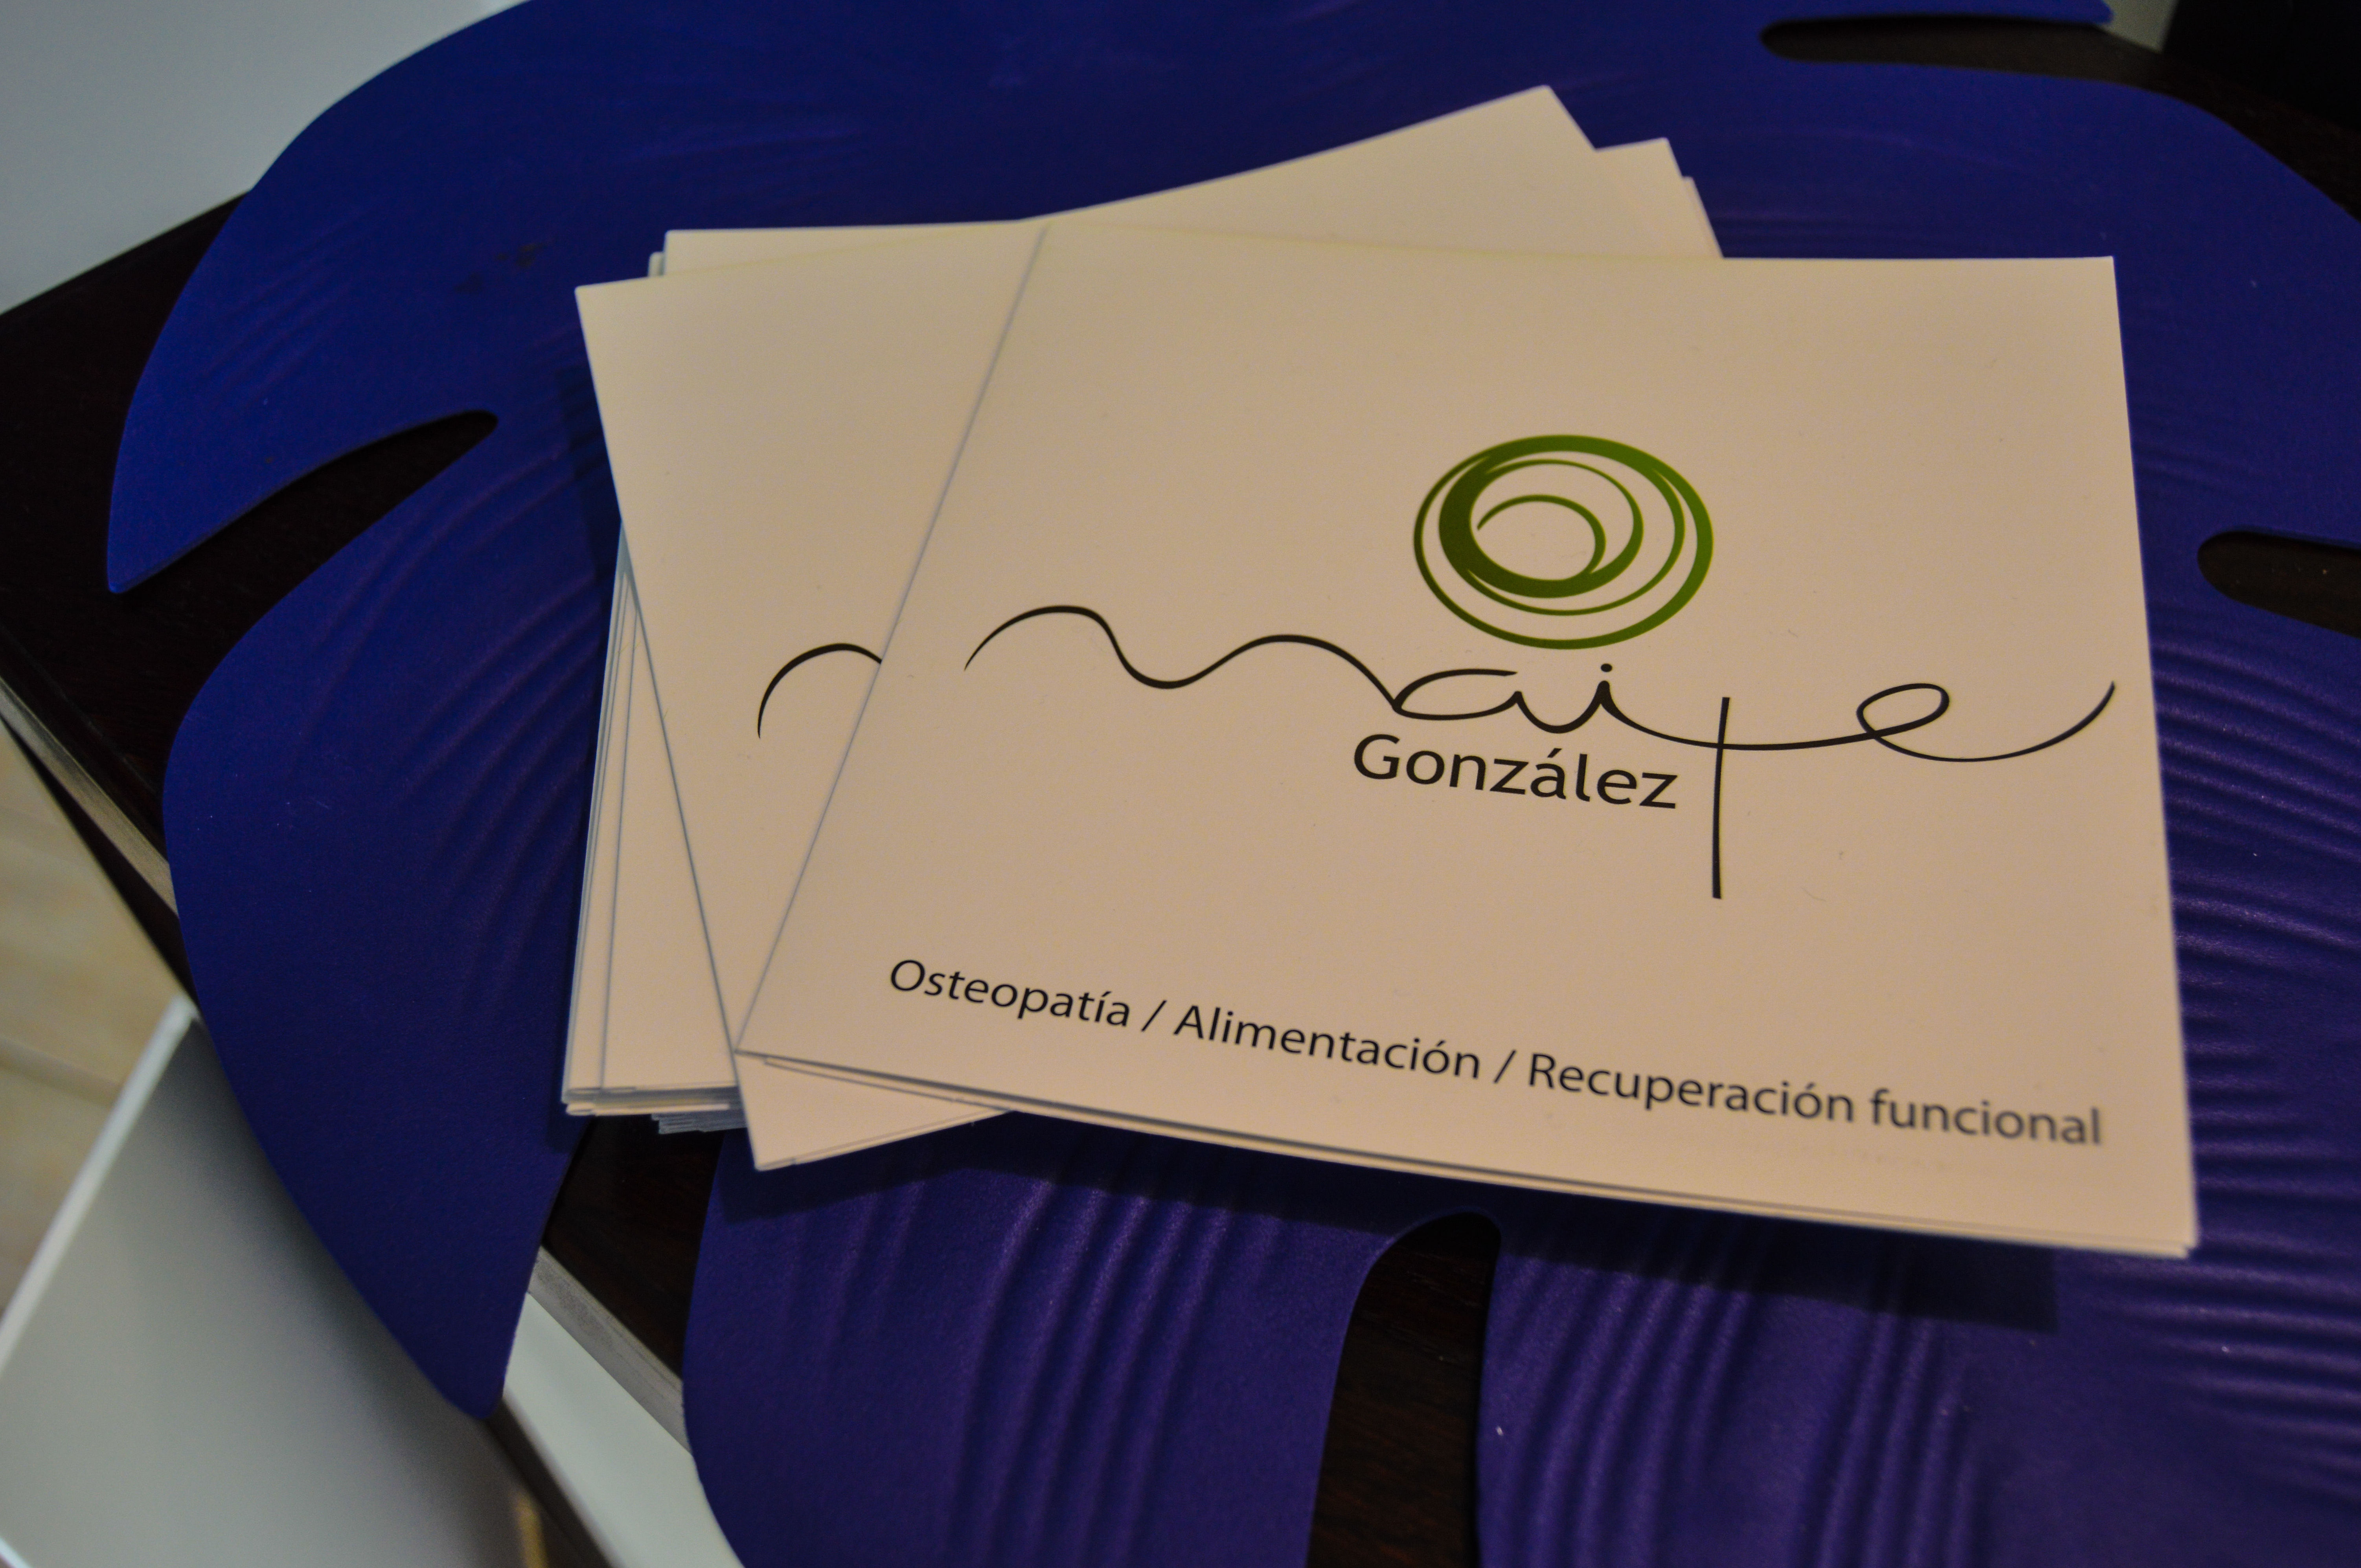 Foto 7 de Osteopatía en Berriatúa | Centro de Osteopatía Maite González